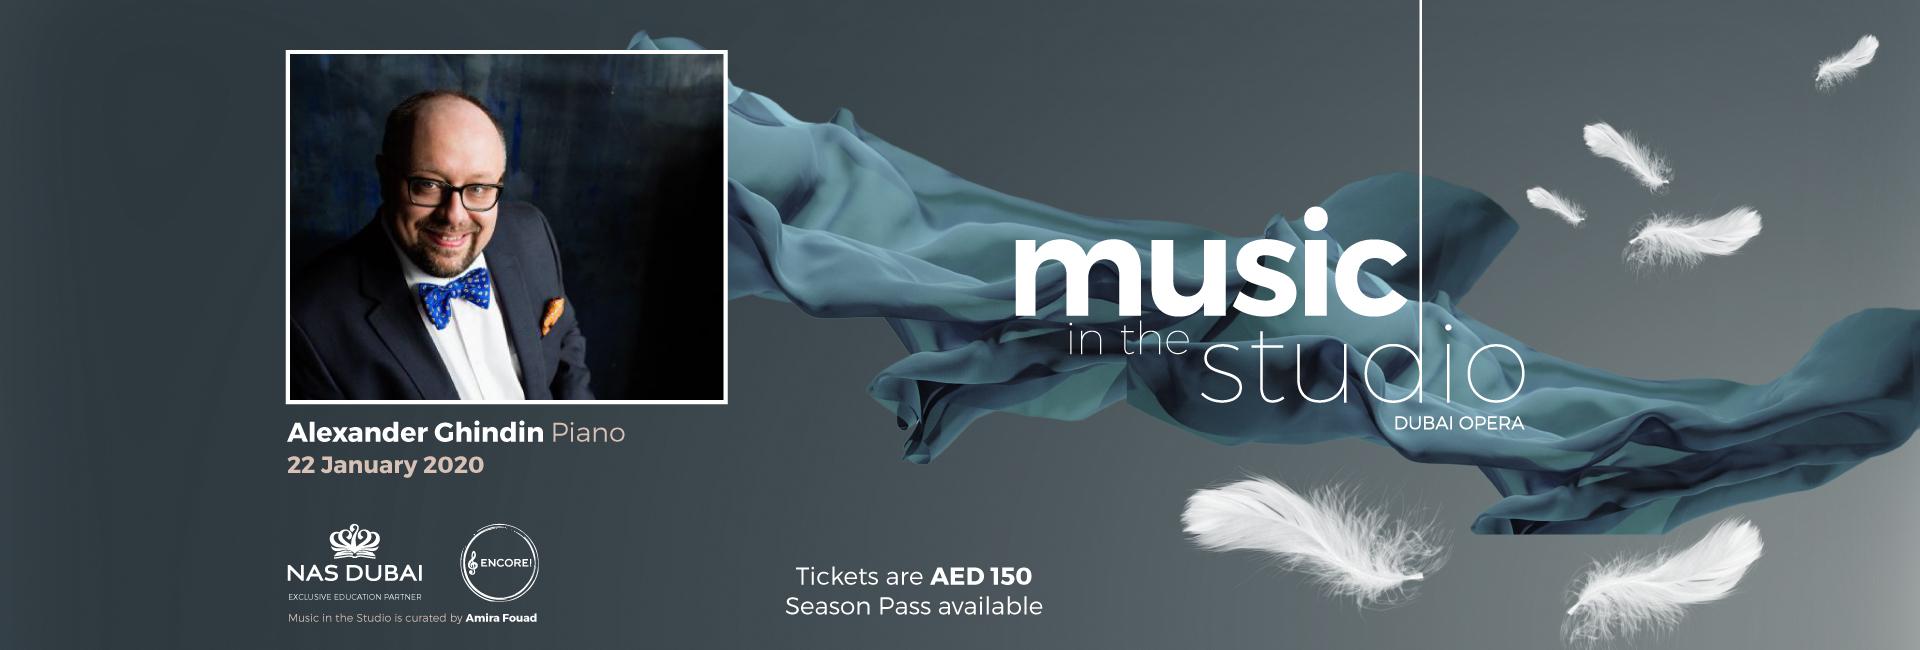 Music in the Studio: Alexander Ghindin on Jan 22nd at Dubai Opera 2020